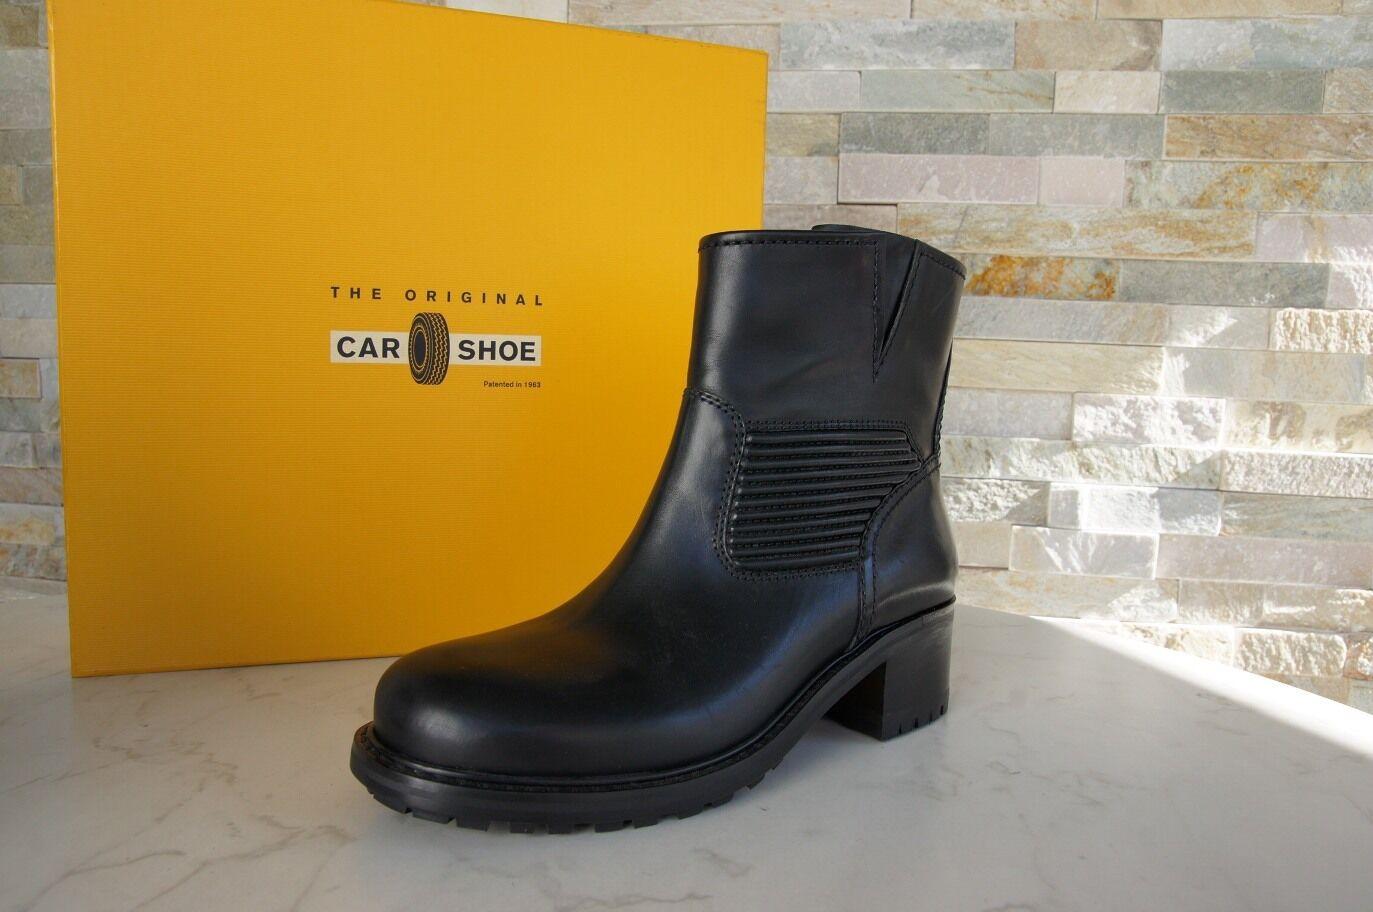 Car zapatos botines talla 41 botaies zapatos zapatos kdt78j kdt78j kdt78j negro nuevo ehemuvp  soporte minorista mayorista